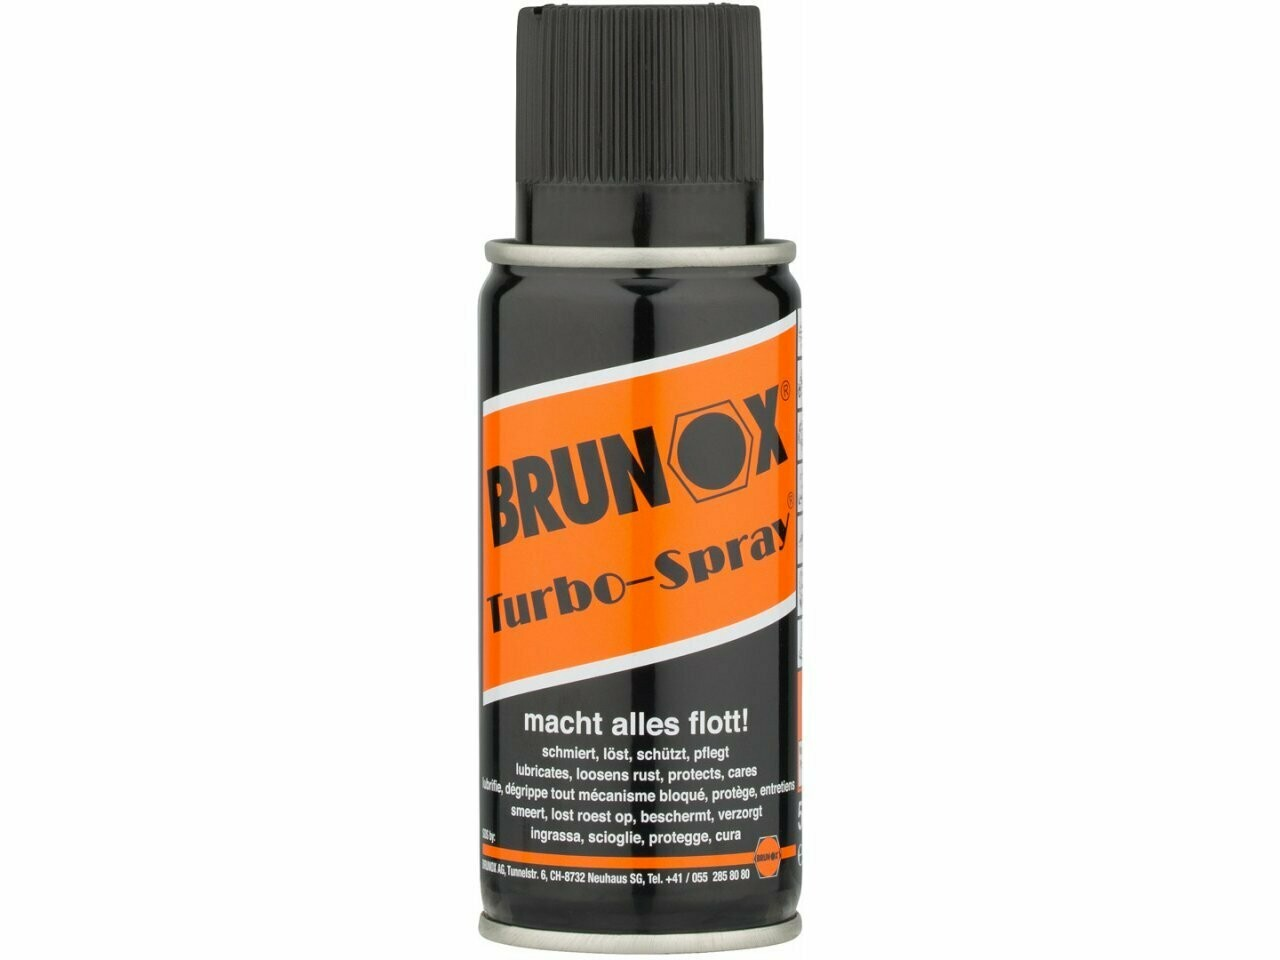 Brunox Gun Care Spray 100Ml